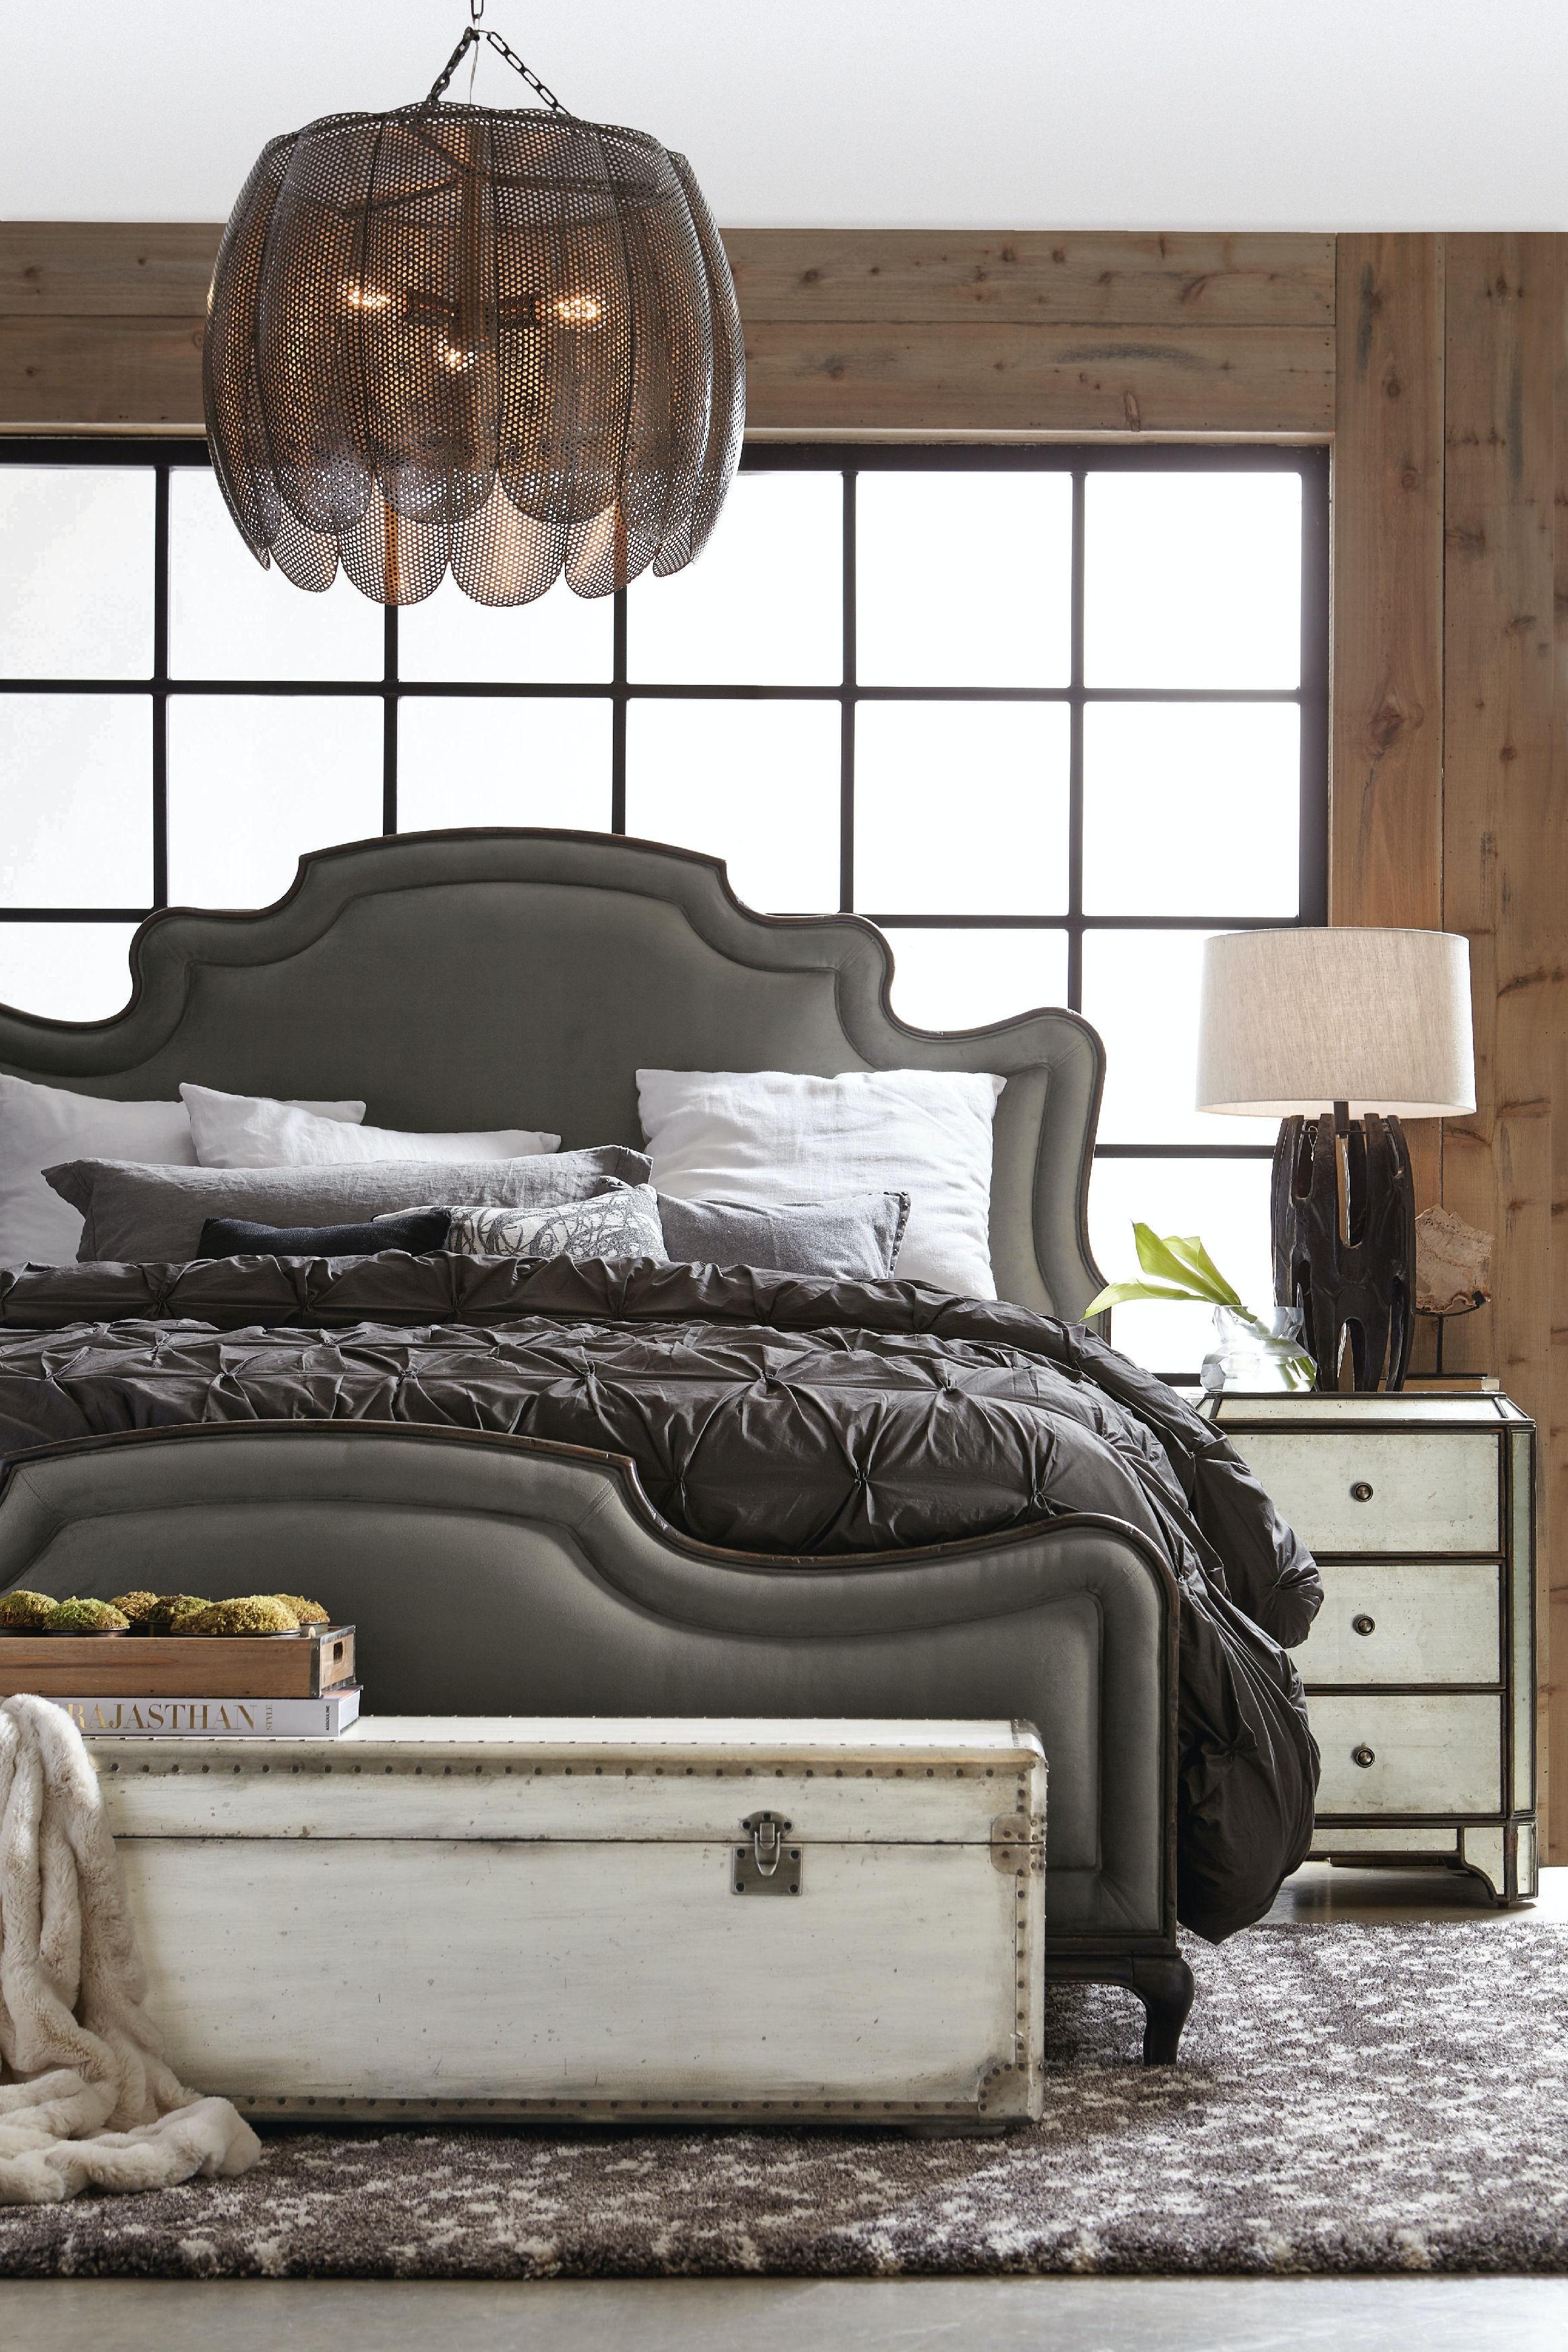 Hooker Furniture Arabella Storage Bench 1610 90019 WH